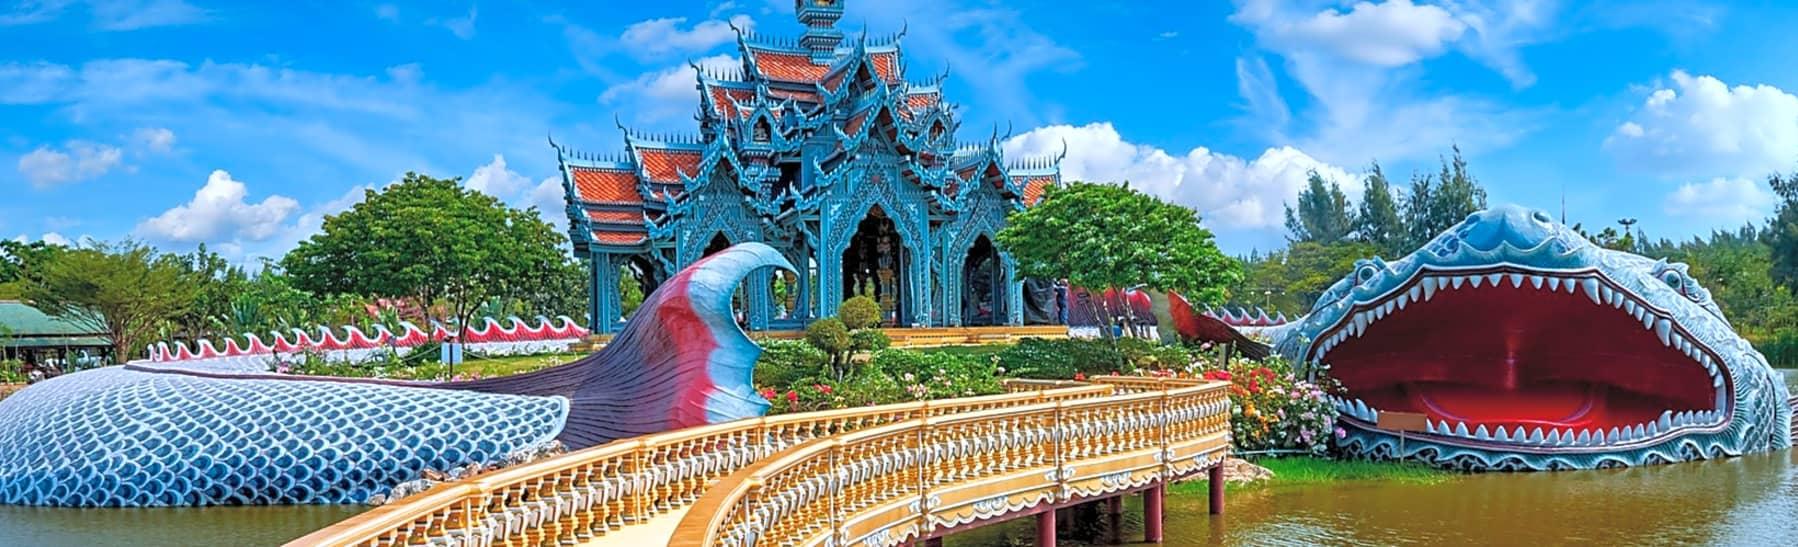 The Trip Guru 感受曼谷行程9折預訂優惠碼:第19張圖片